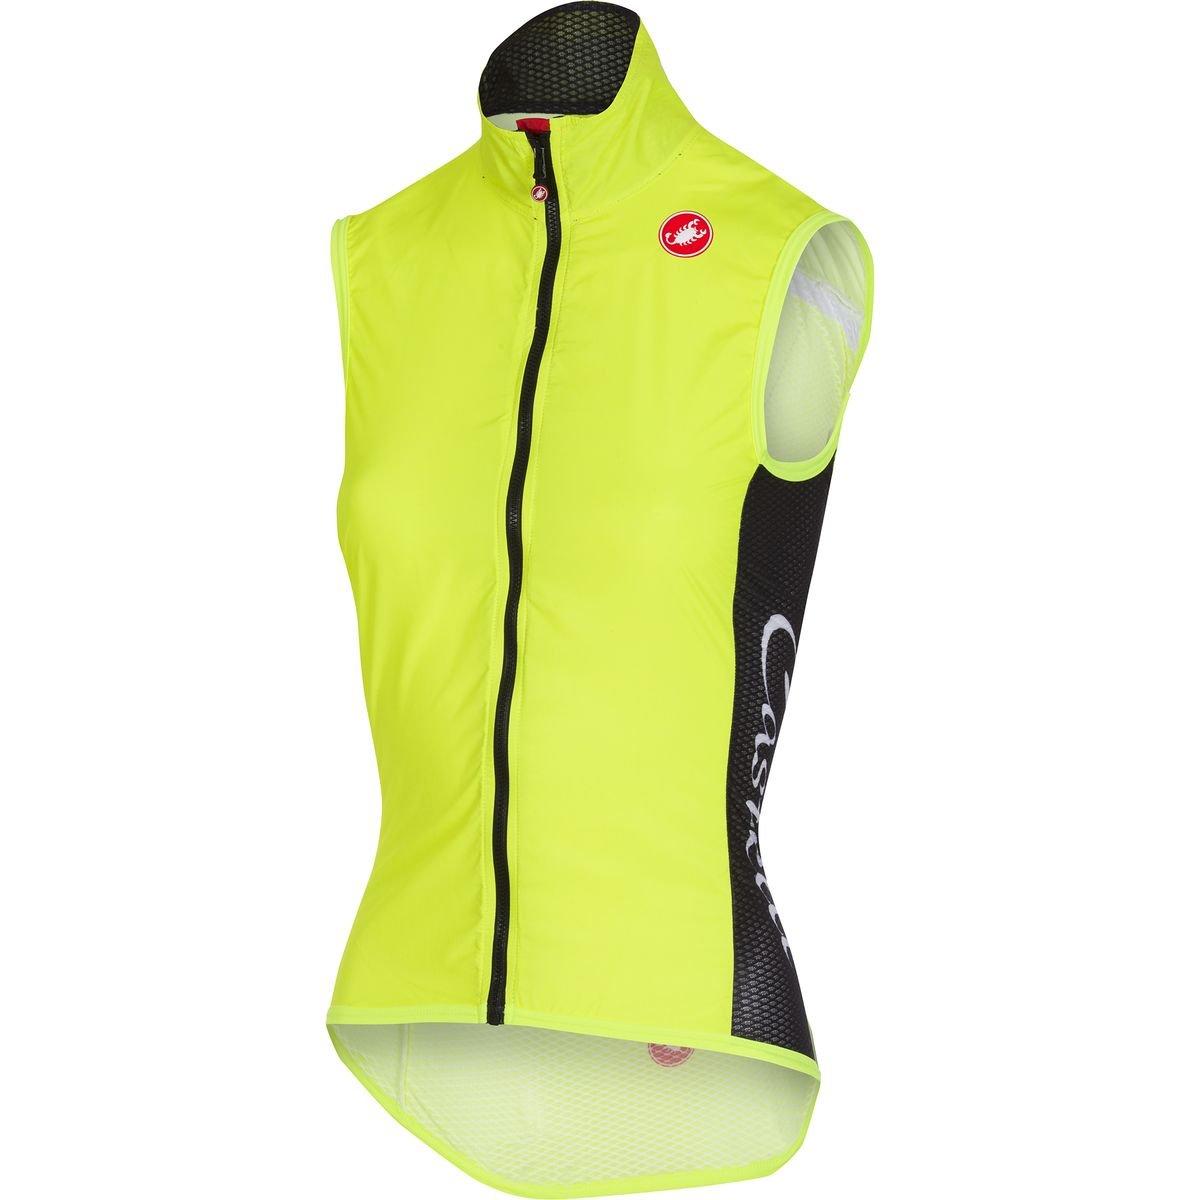 Castelli Damen Radsportweste Pro Light W Wind Vest gelb 510 S